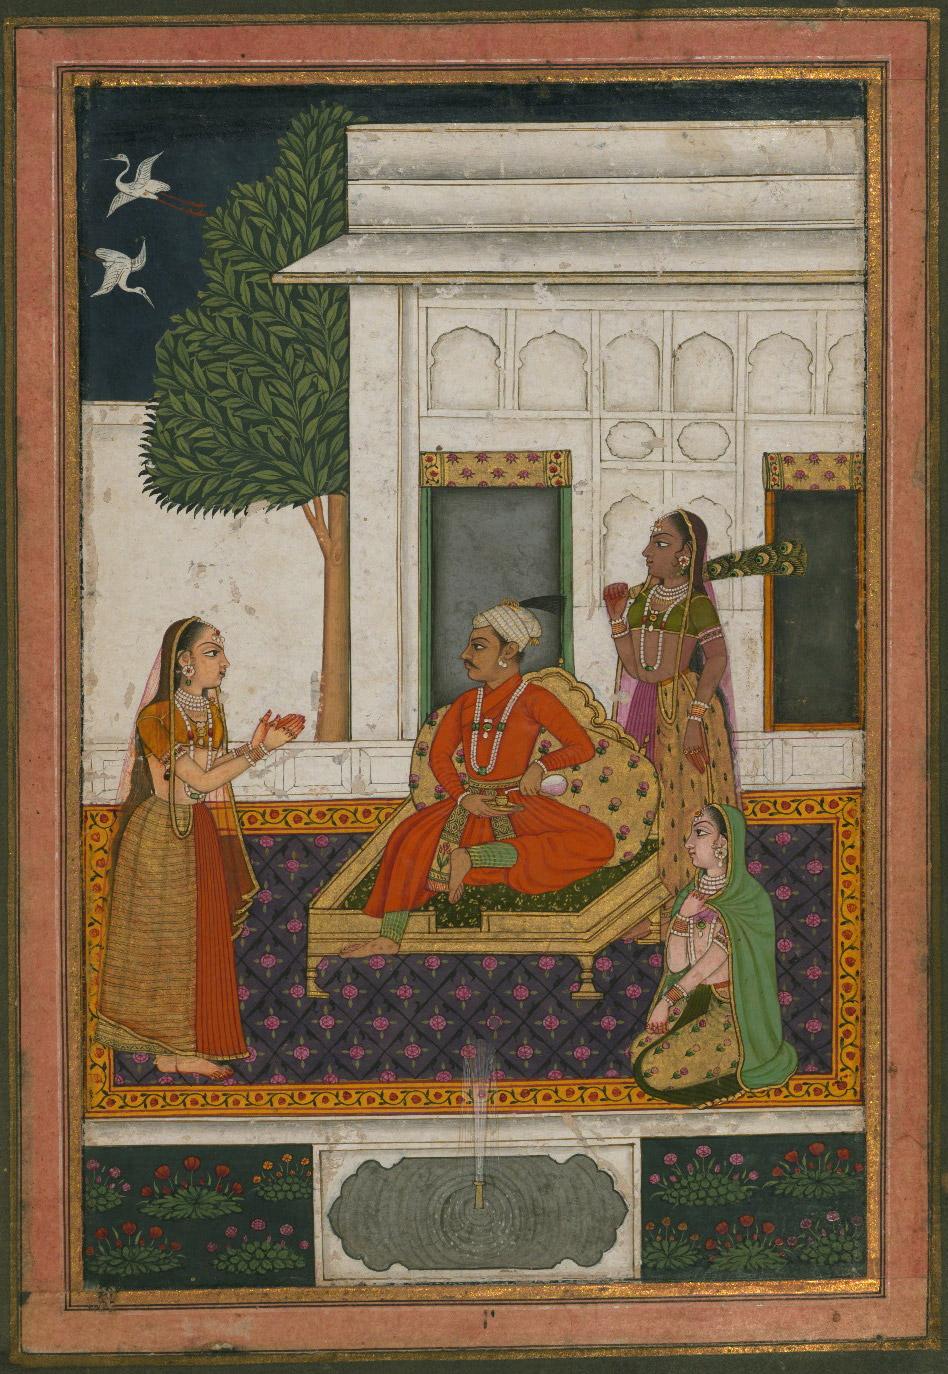 Malavakausa Raga (Malakausika, Malakausa, Malkos Raga) - Miniature Painting, Deccan School, Ragamala series, 19th Century